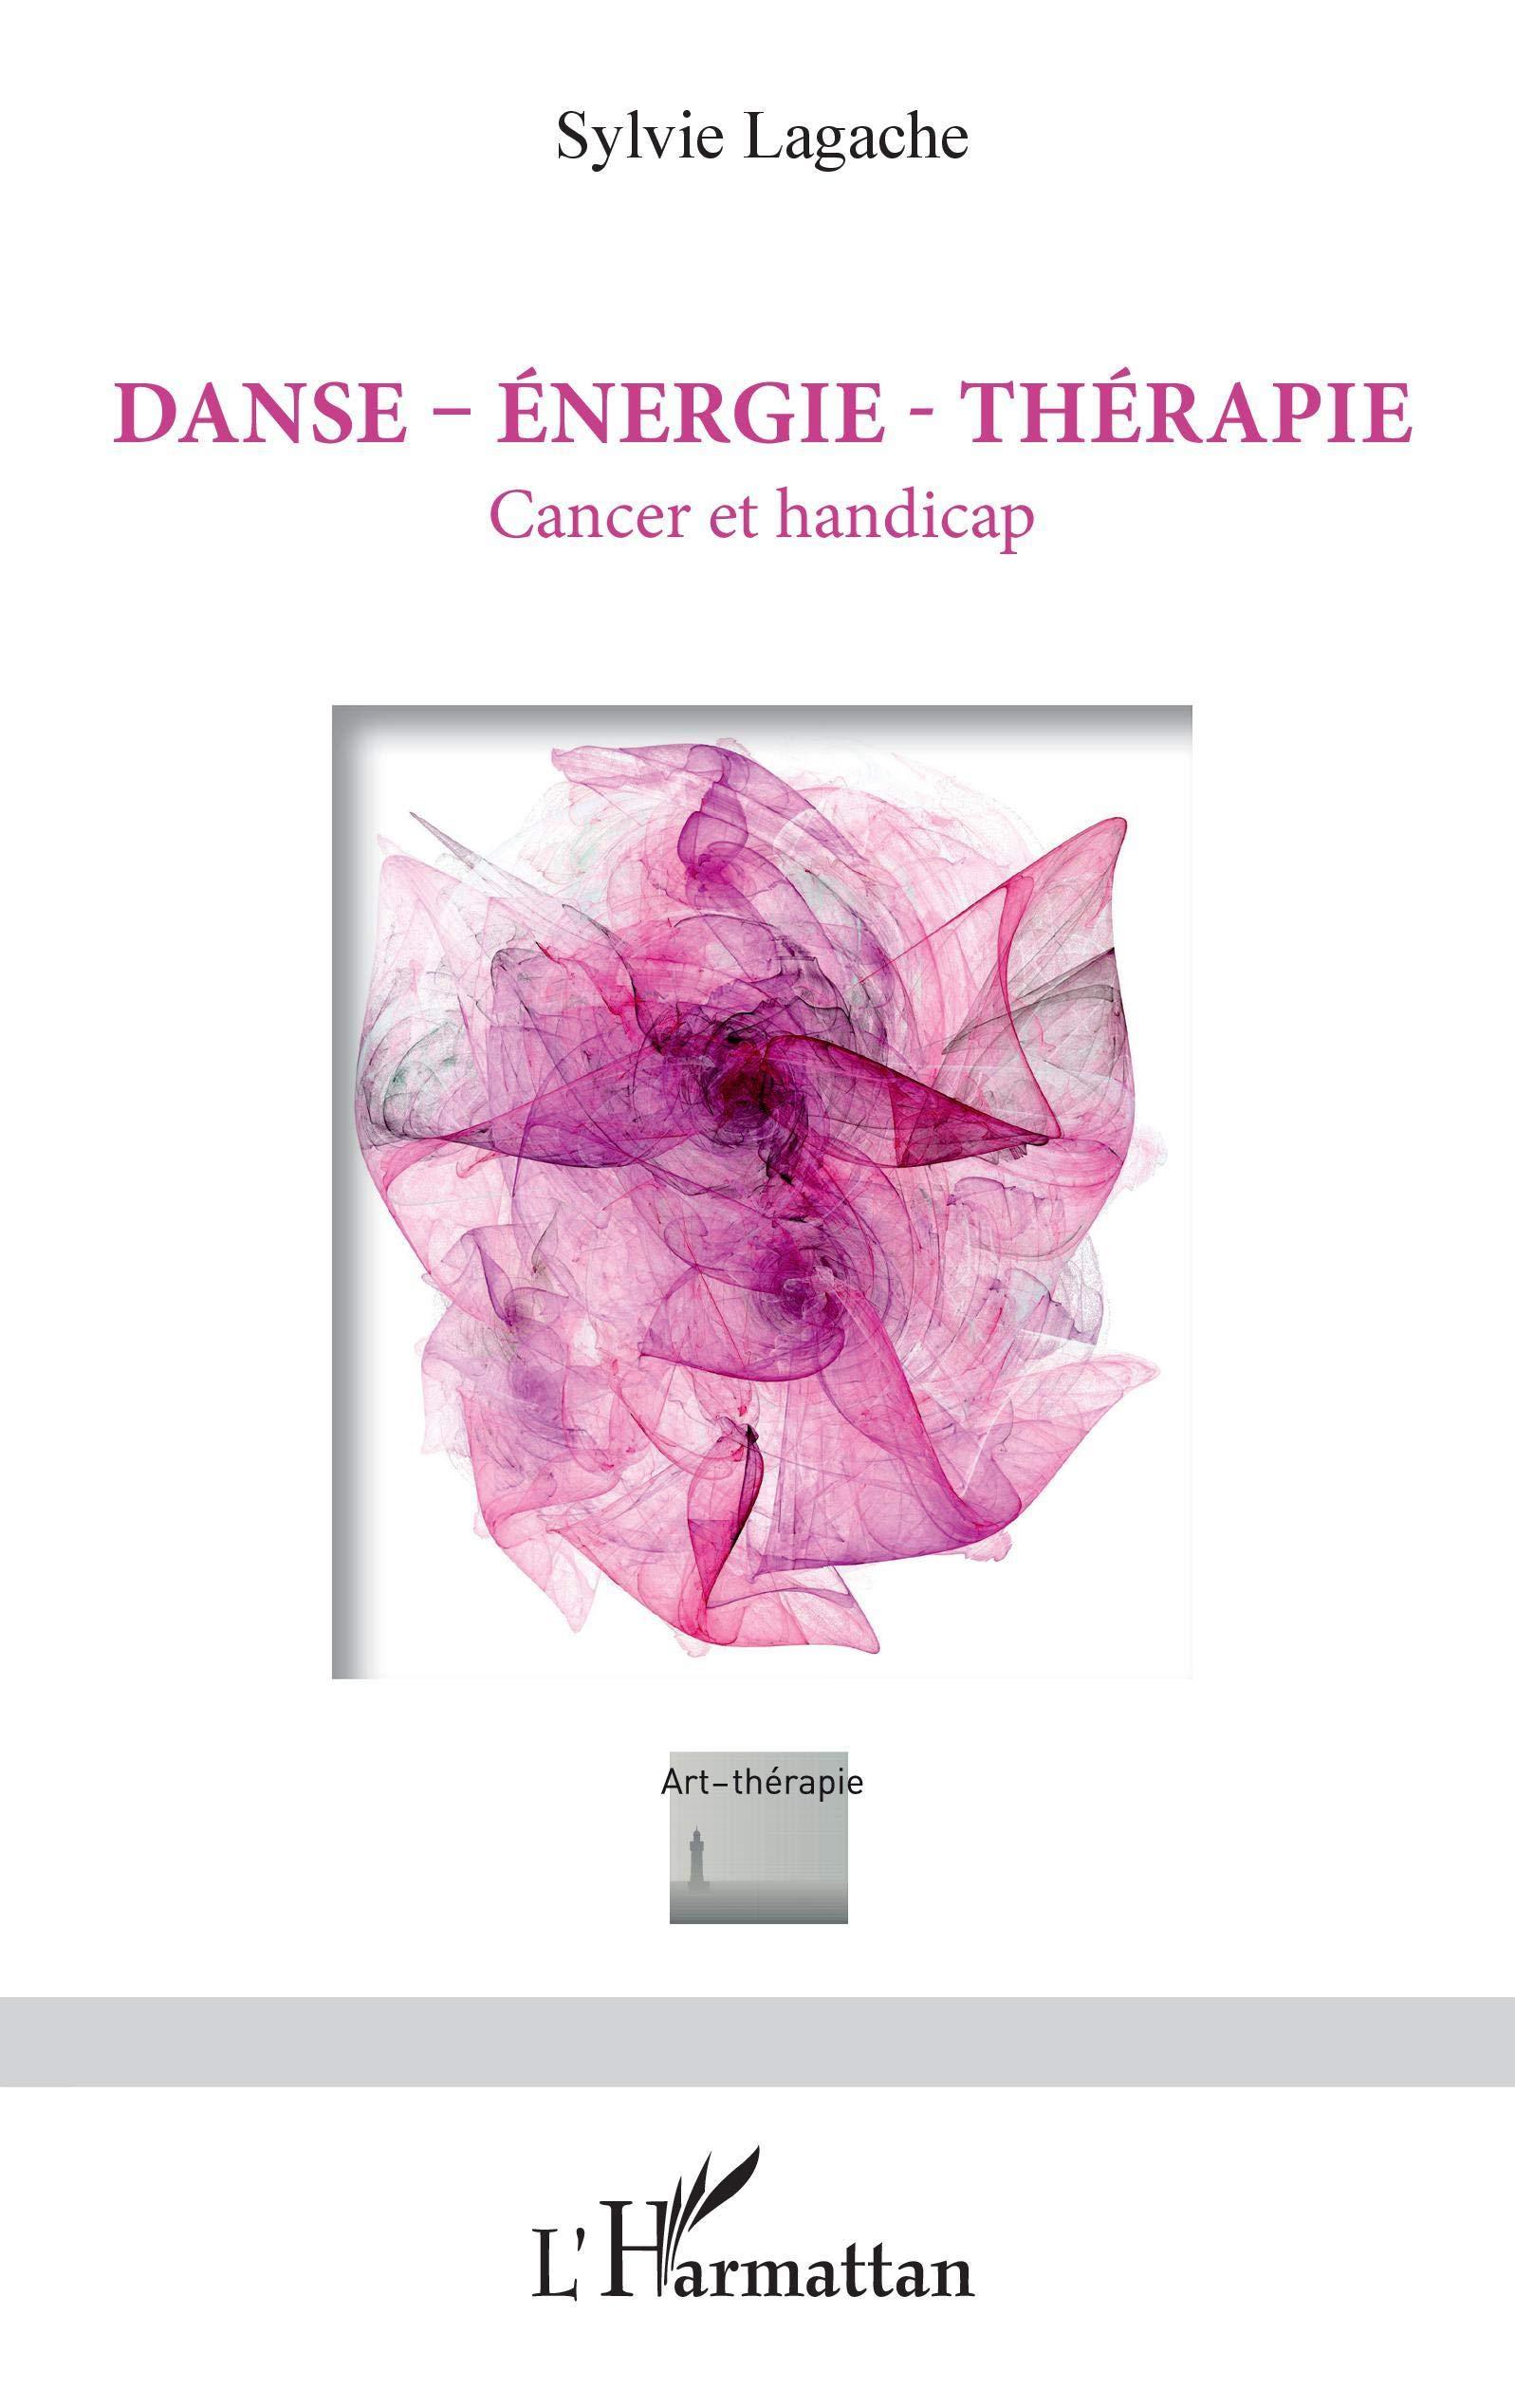 cancerul este un handicap